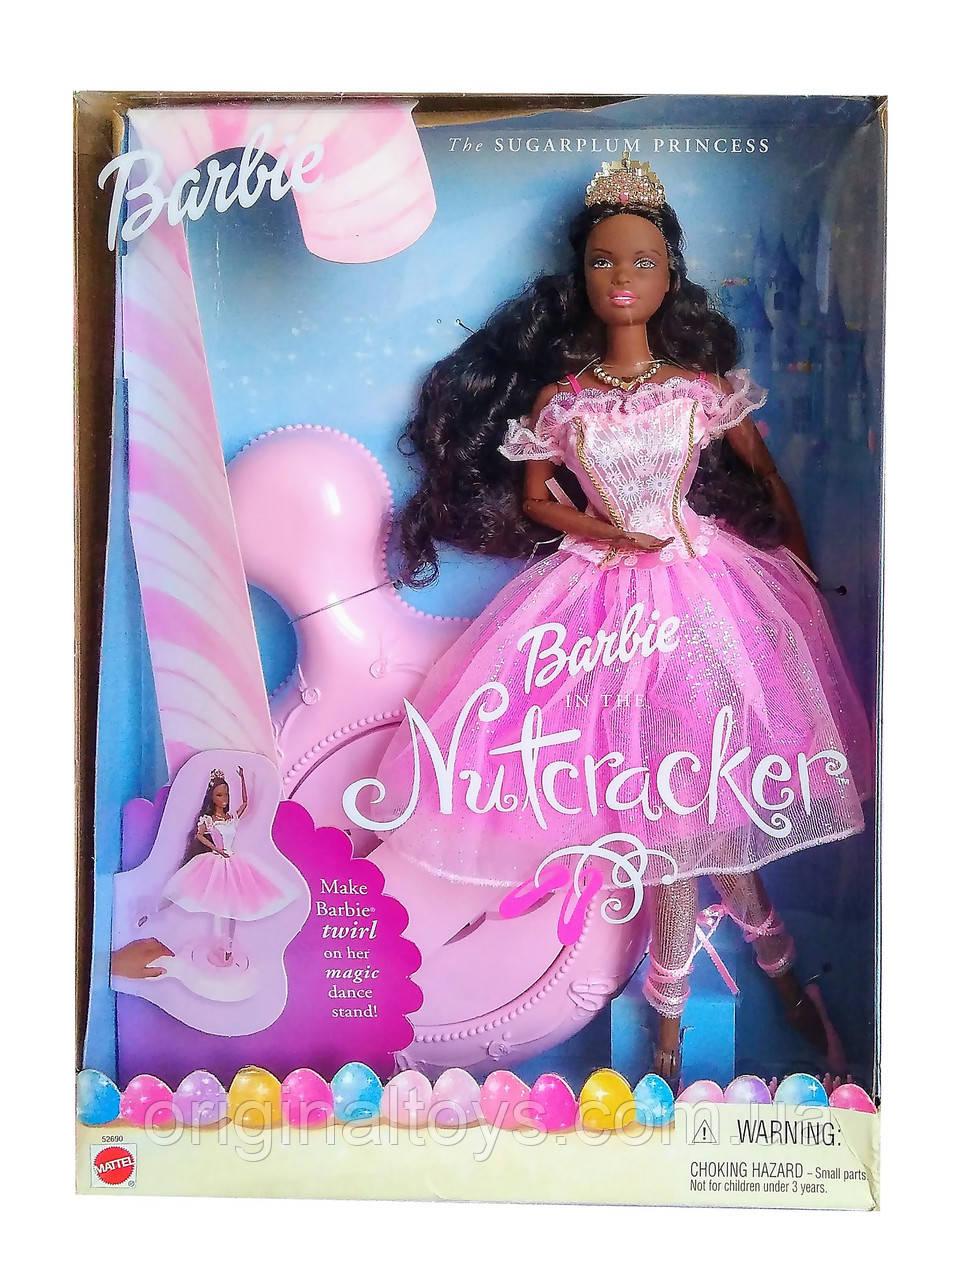 Коллекционная кукла Барби Принцесса Сахарная Слива Щелкунчик Barbie Sugarplum The Nutcracker 2001 Mattel